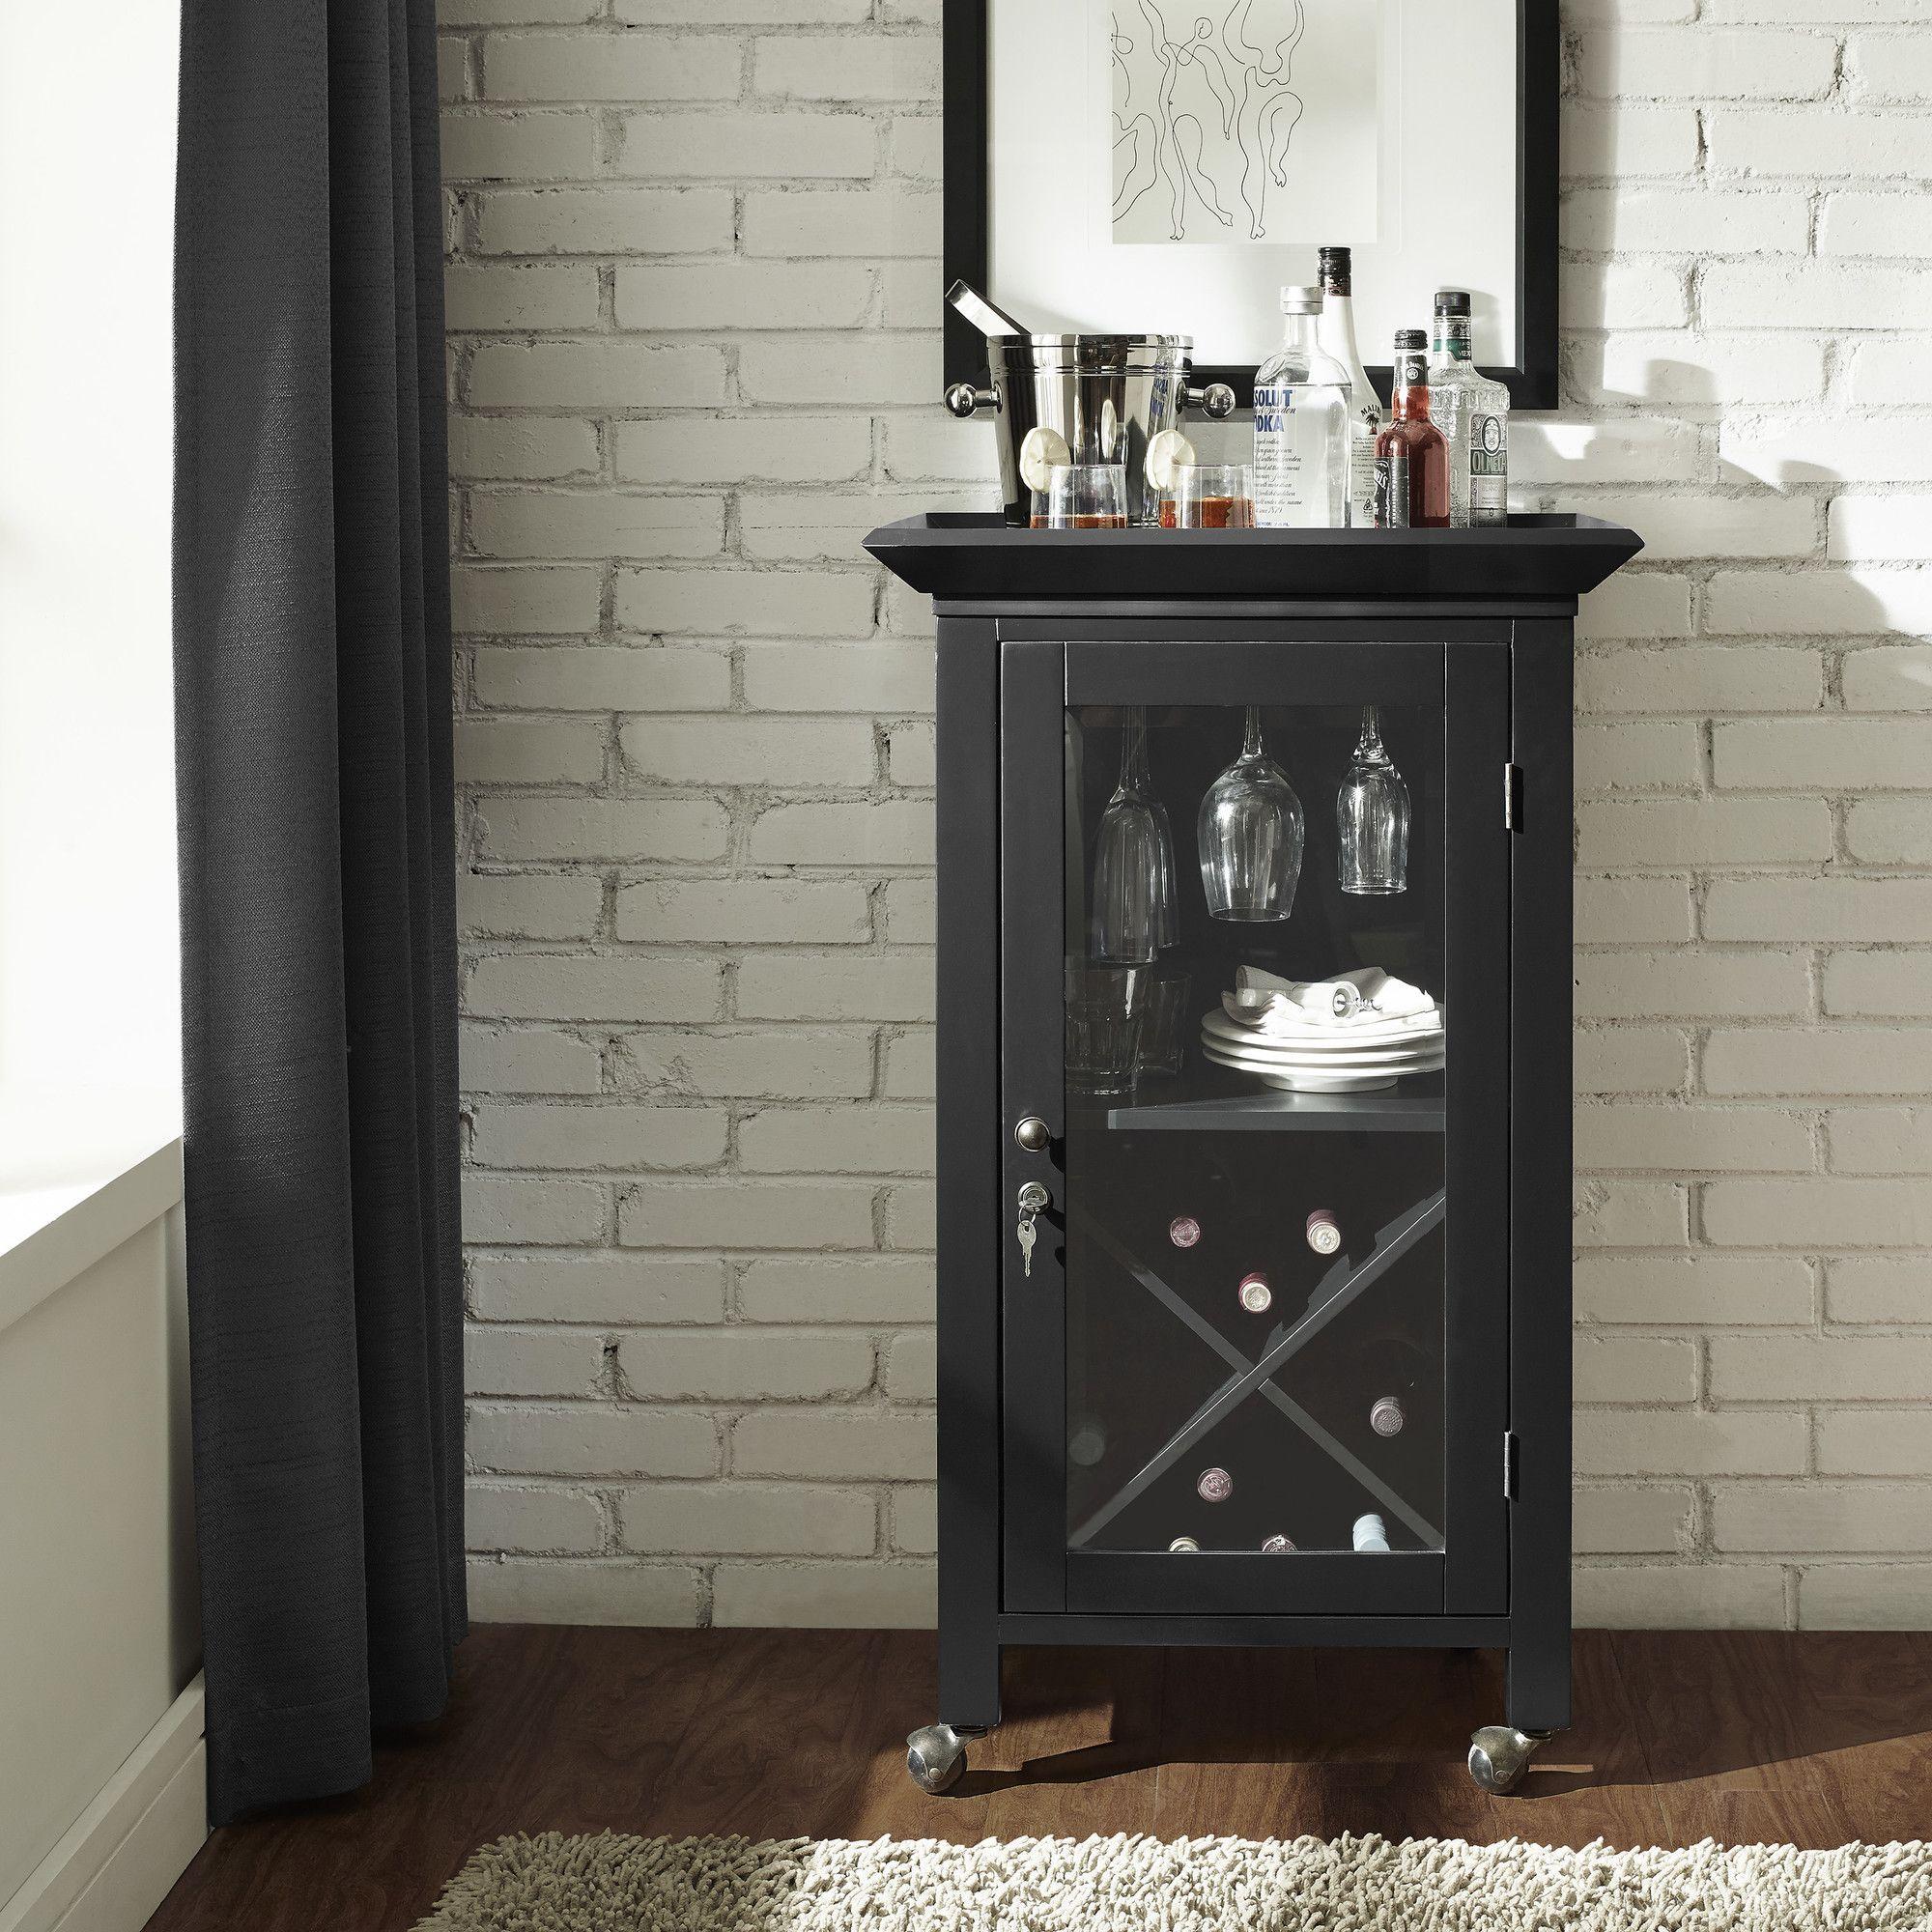 Crosley Jefferson Portable Bar Cabinet Reviews Wayfair Home Bar Cabinet Bar Furniture Bar Cabinet